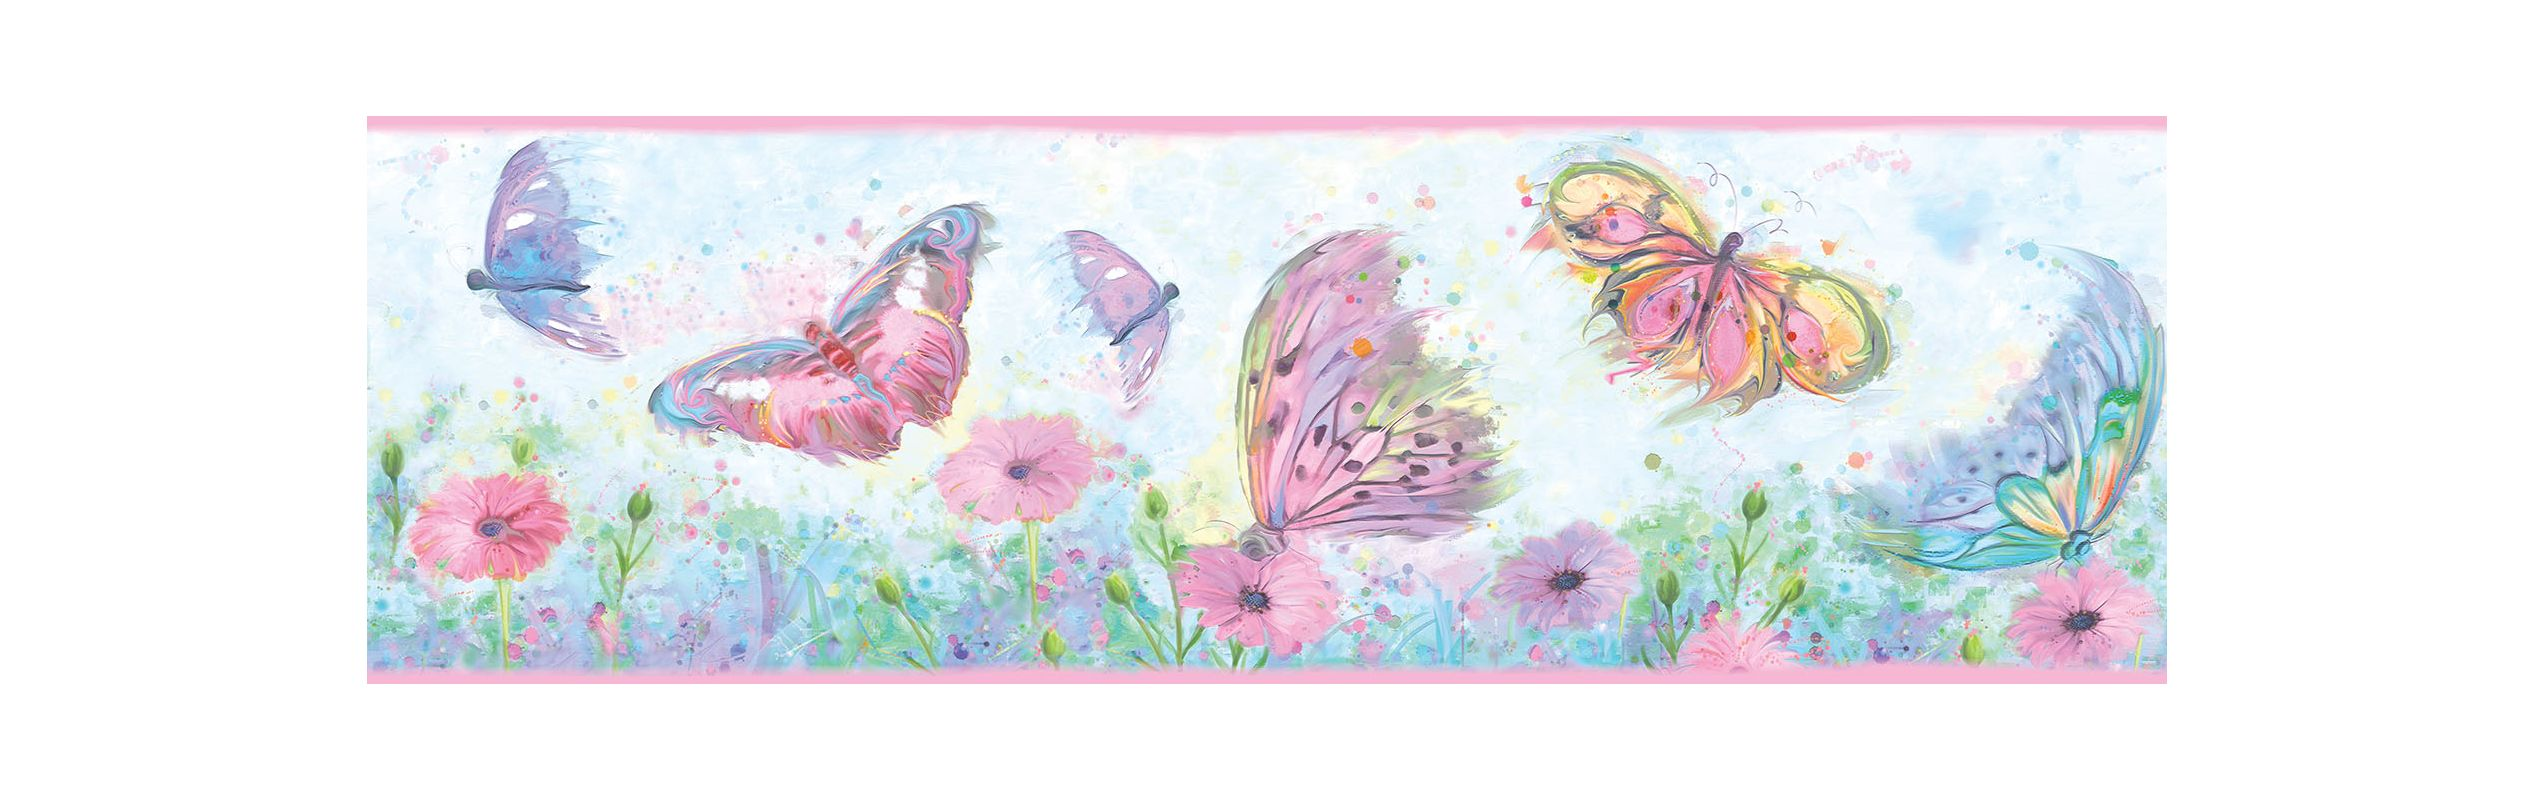 Brewster HAS01002B Ava Pink Butterfly Swoosh Border Wallpaper Pink